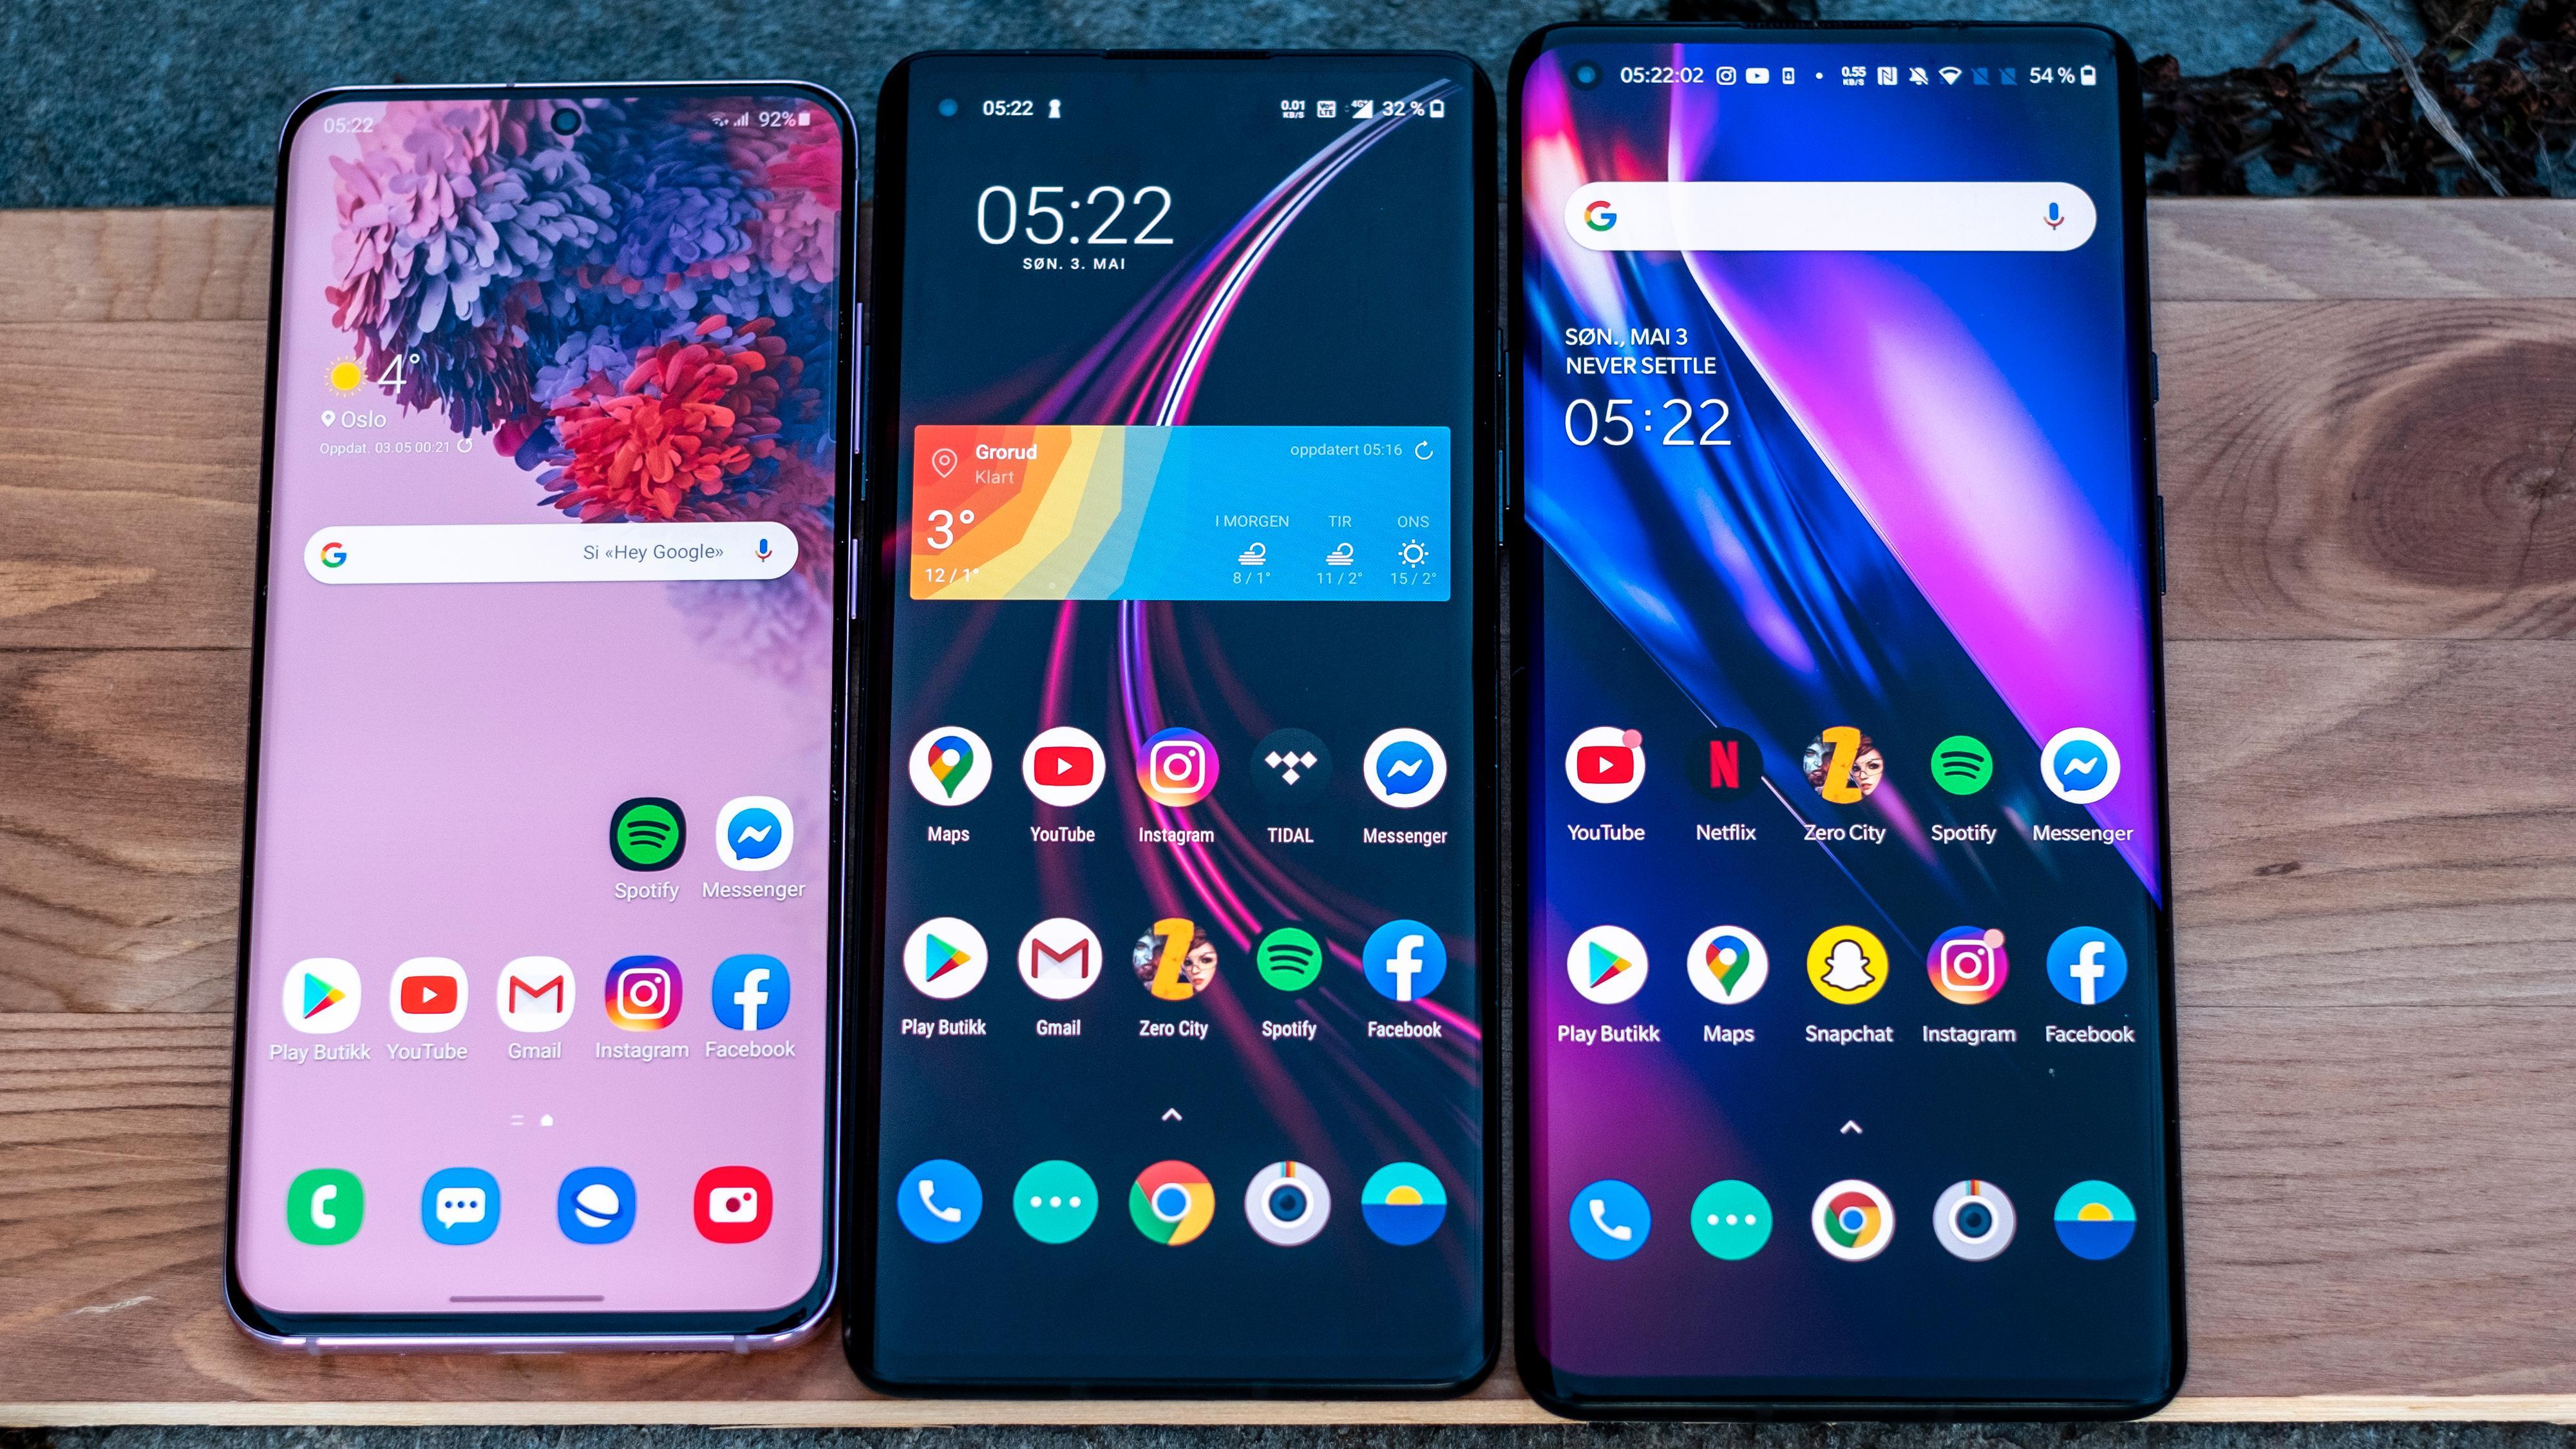 Fra venstre: Samsung Galaxy S20, OnePlus 8, OnePlus 8 Pro.